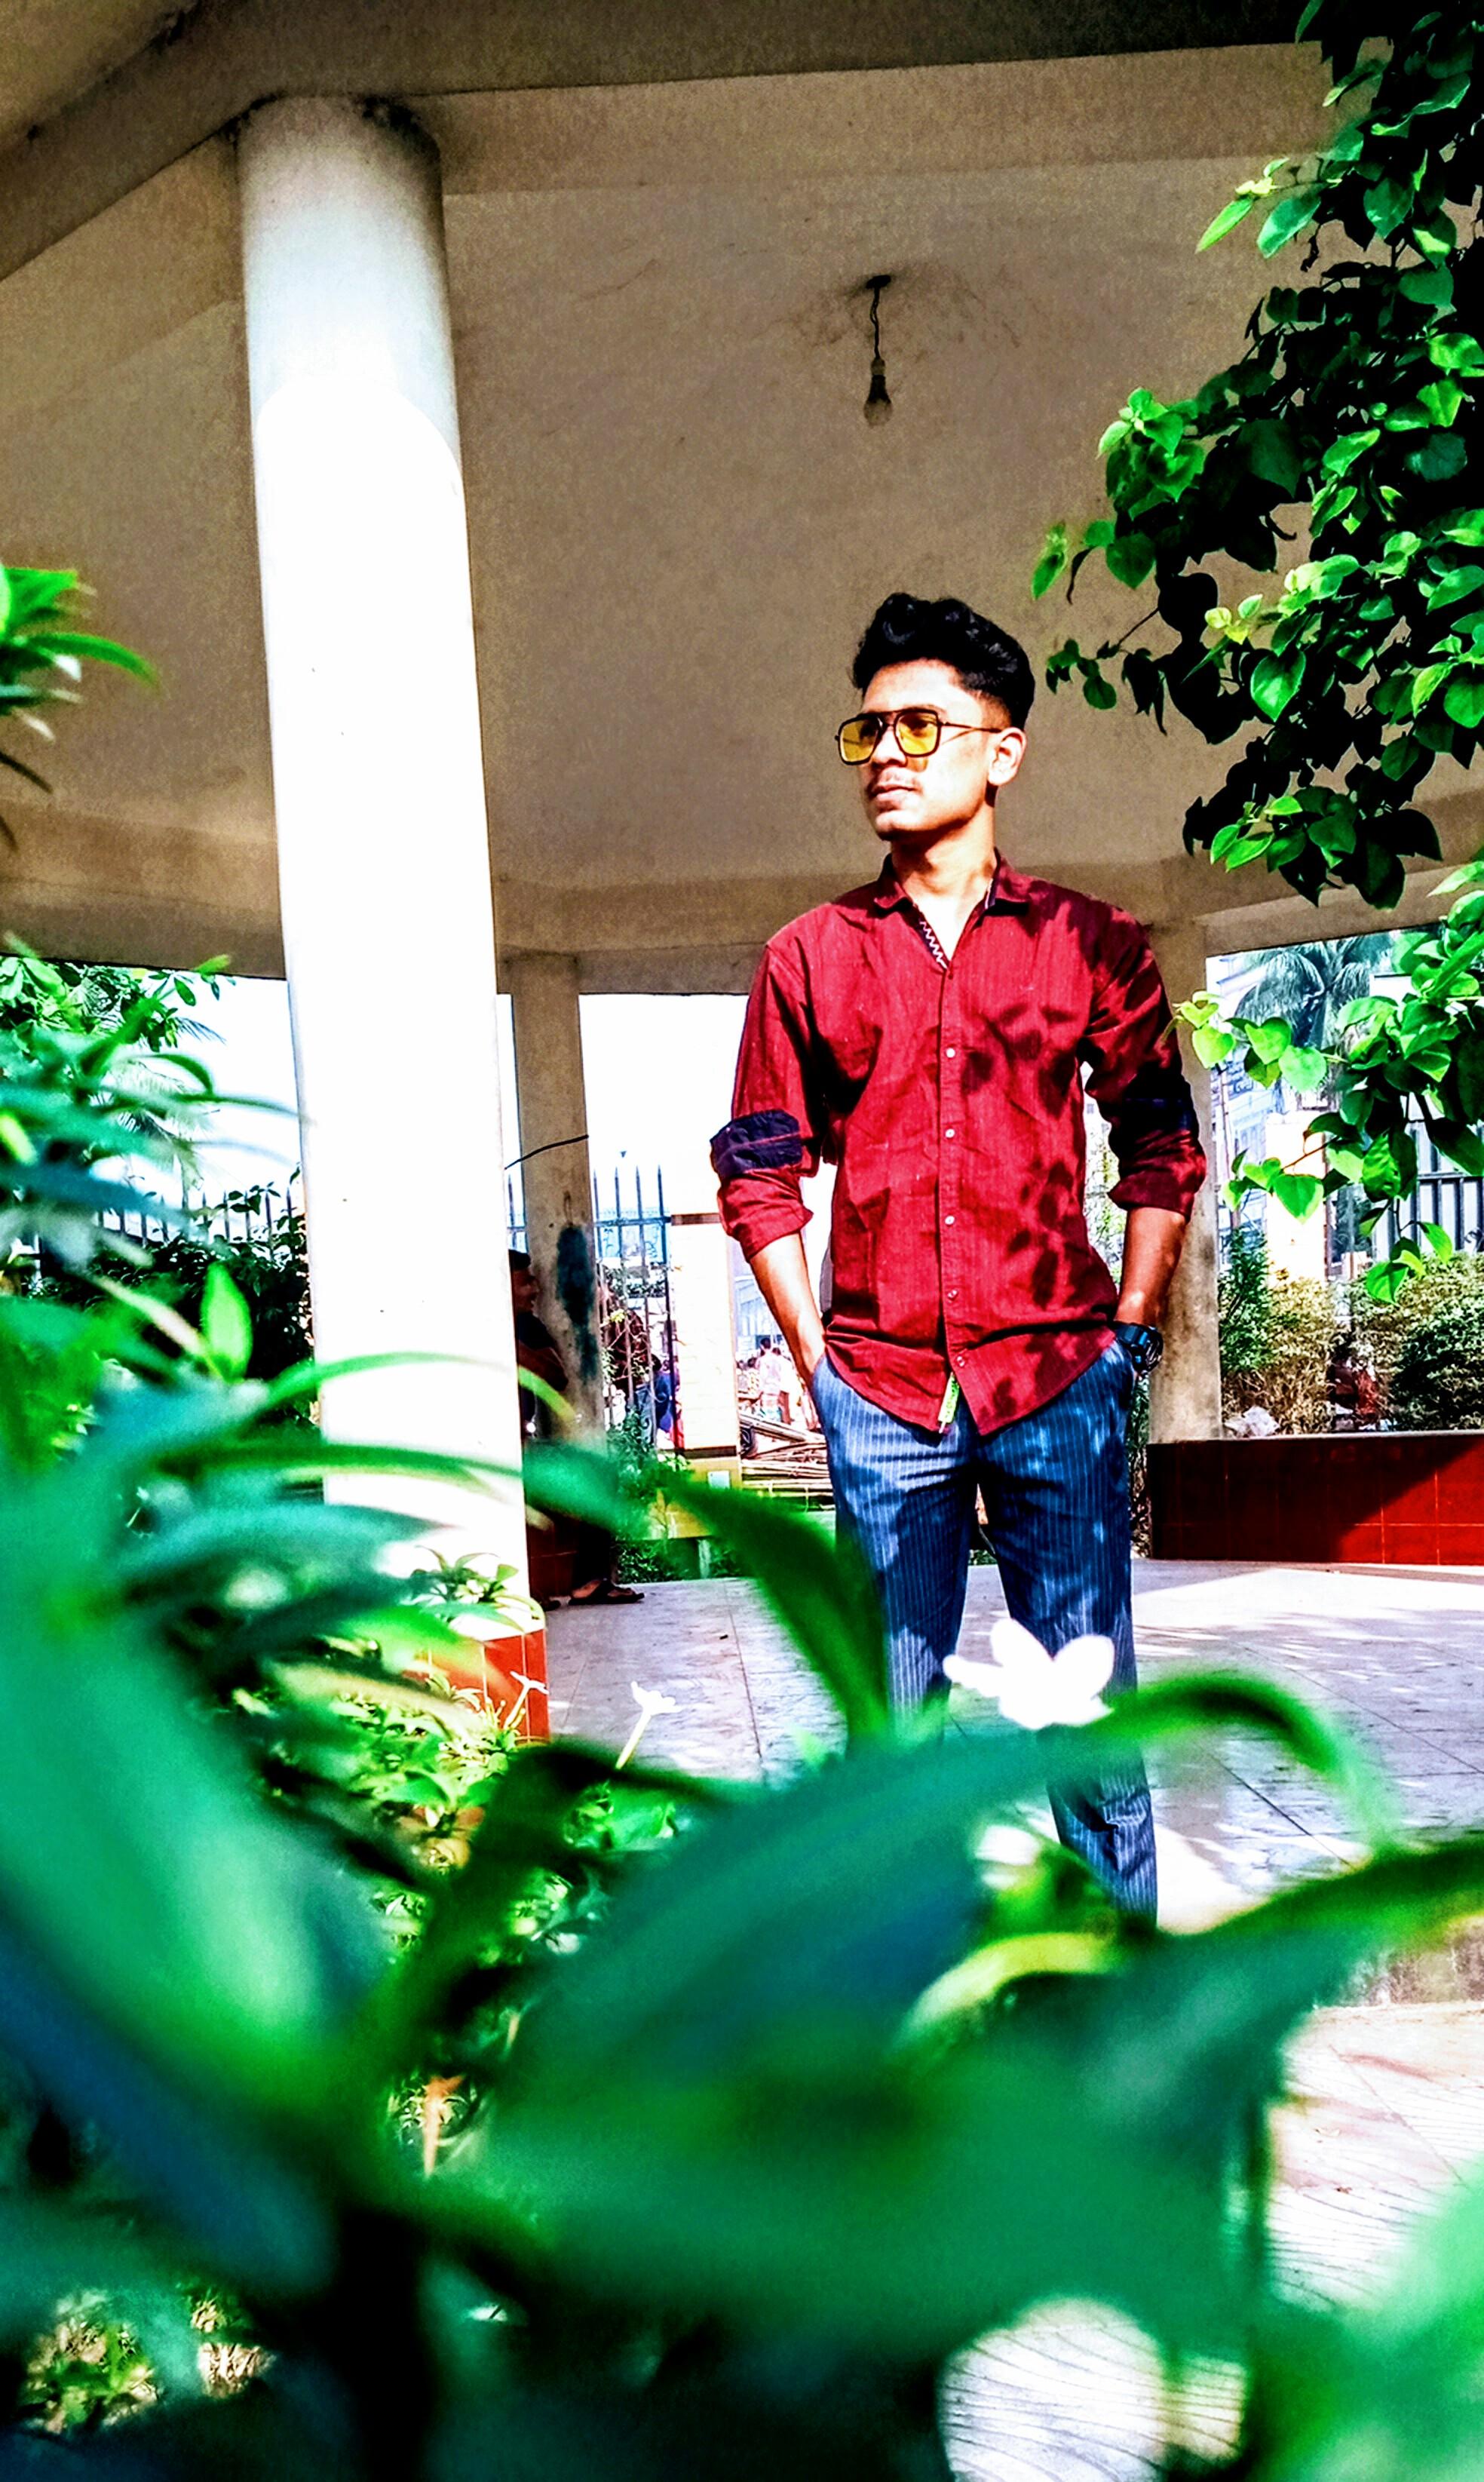 Shovon Ahmed